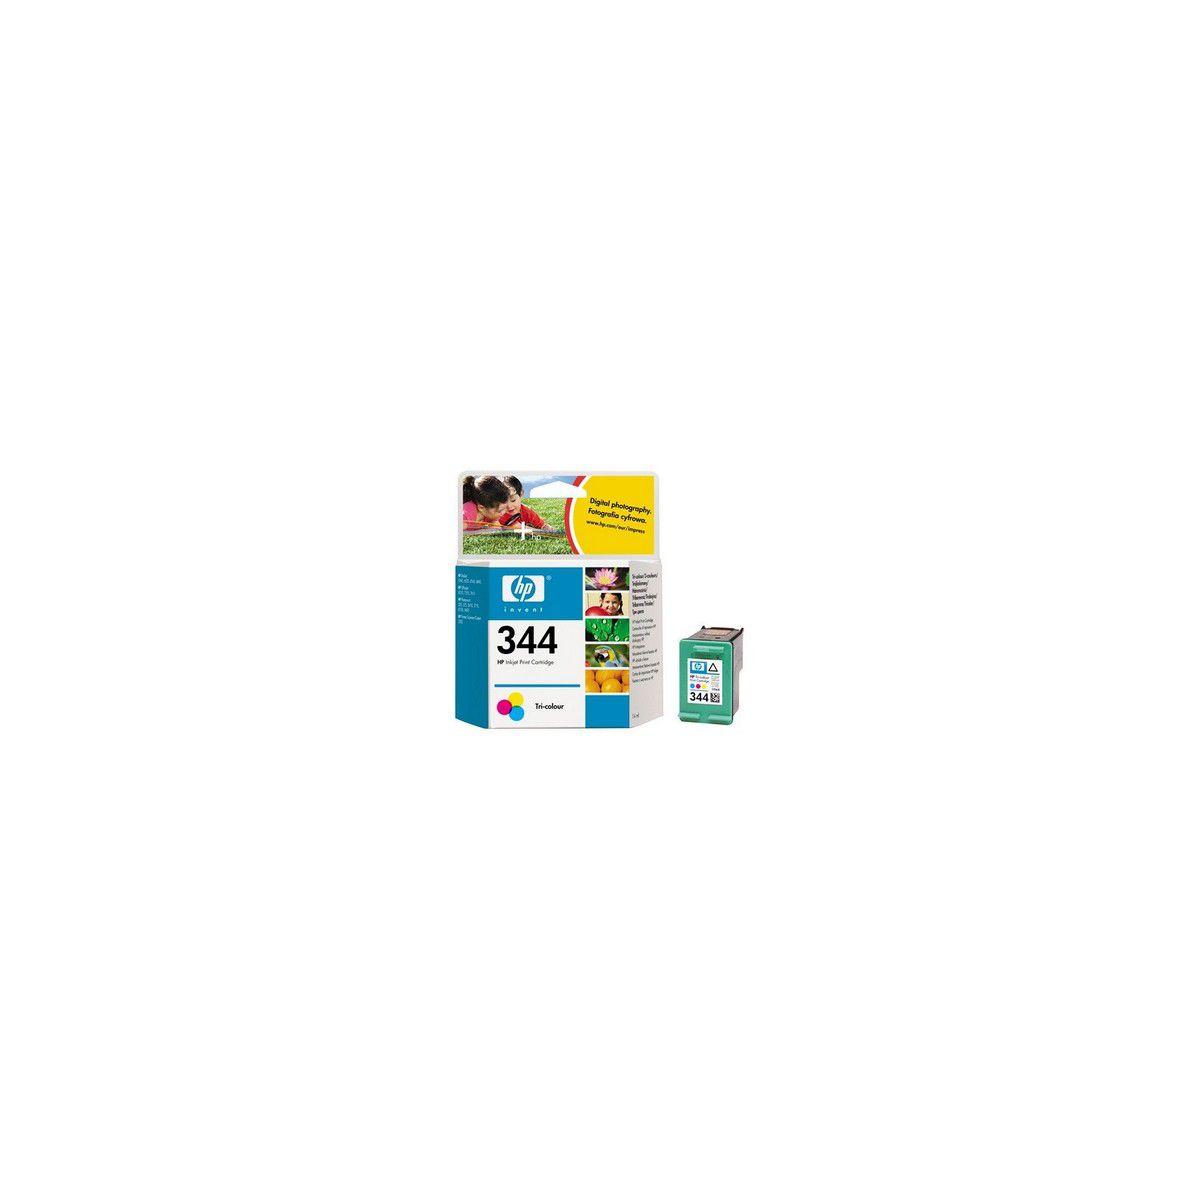 Multipack cartouches d'encre HP n°344 Couleur (Jaune, Magenta, Cyan)